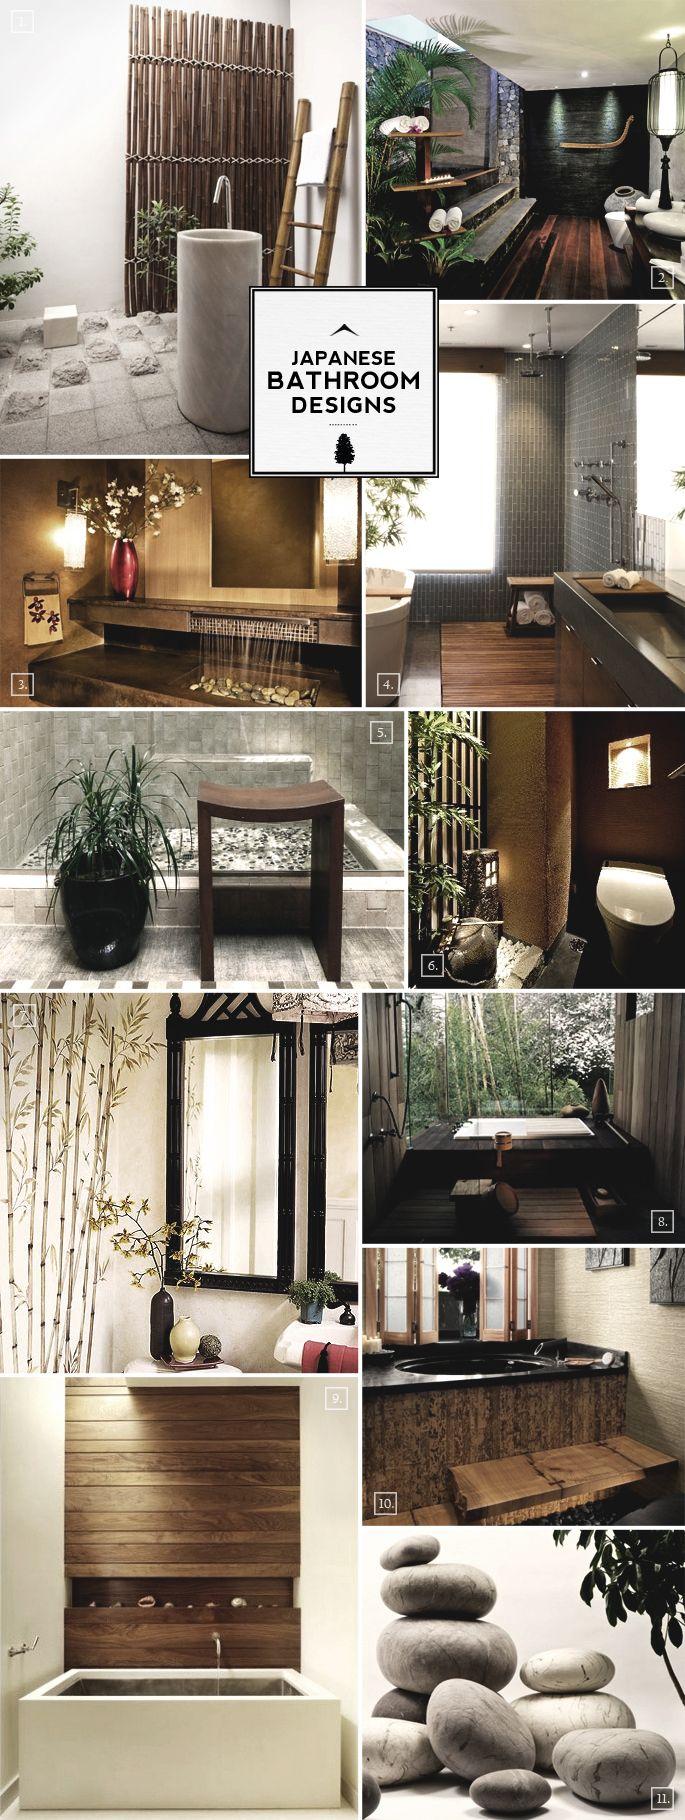 Zen Style Japanese Bathroom Design Ideas Japanese Bathroom